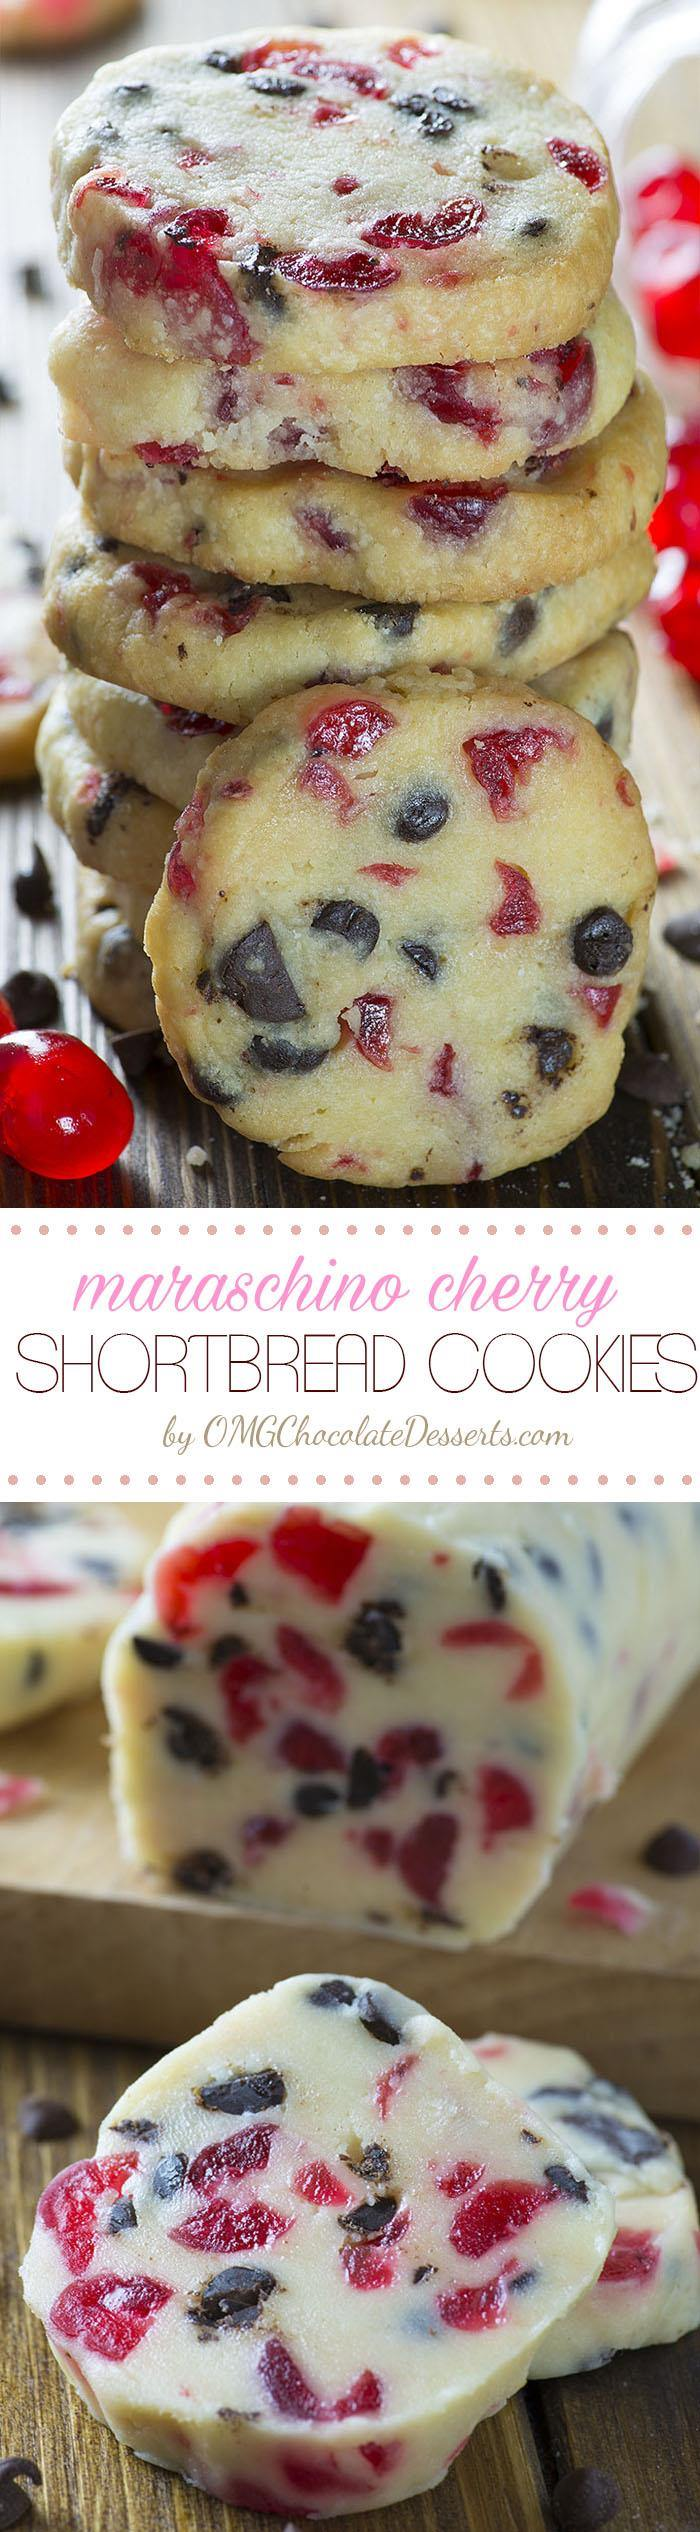 Christmas Maraschino Cherry Shortbread Cookies